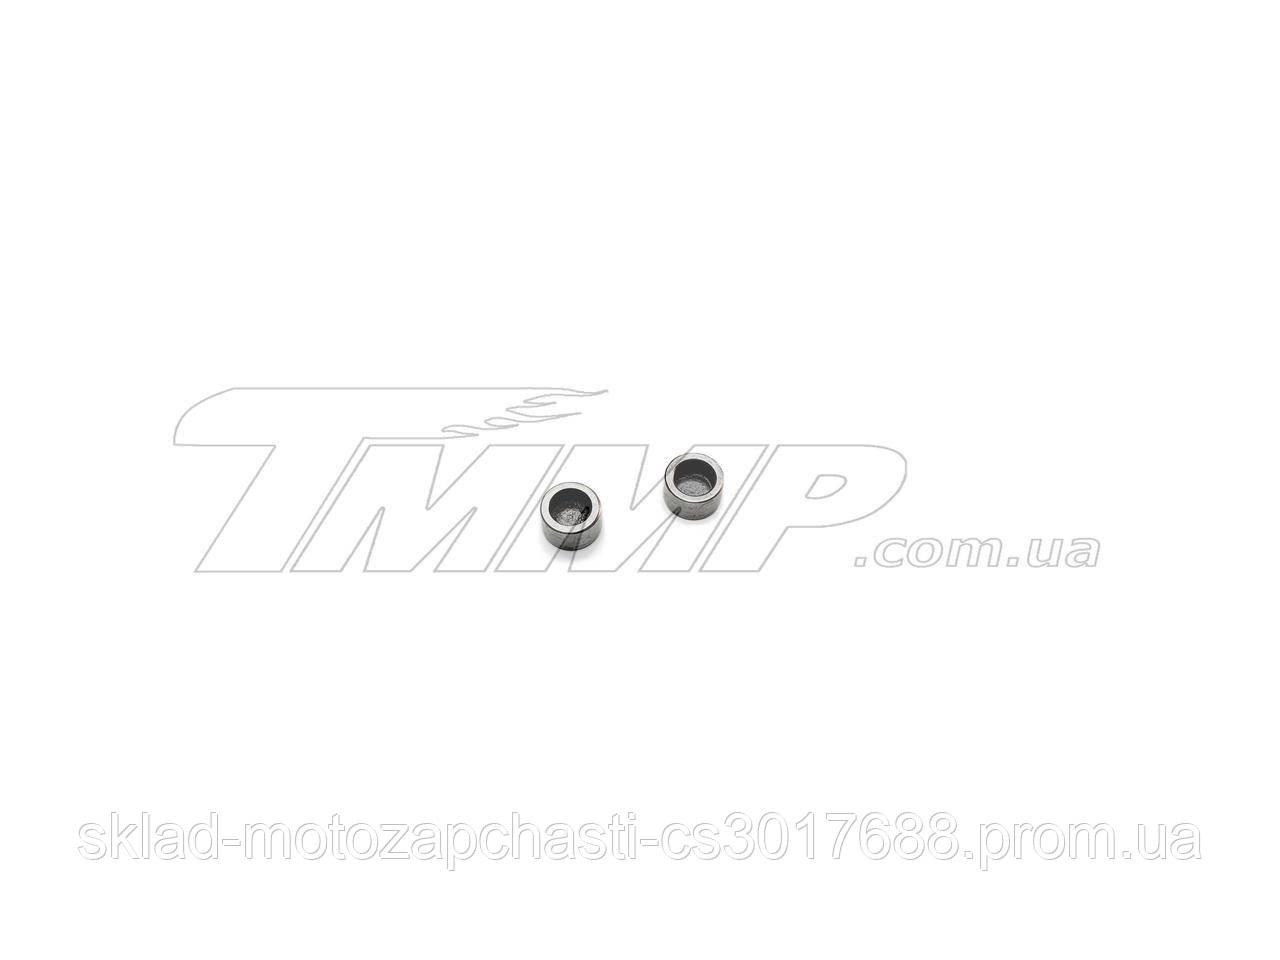 Компенсатор клапана 168F (пара) Артикул: K-5262